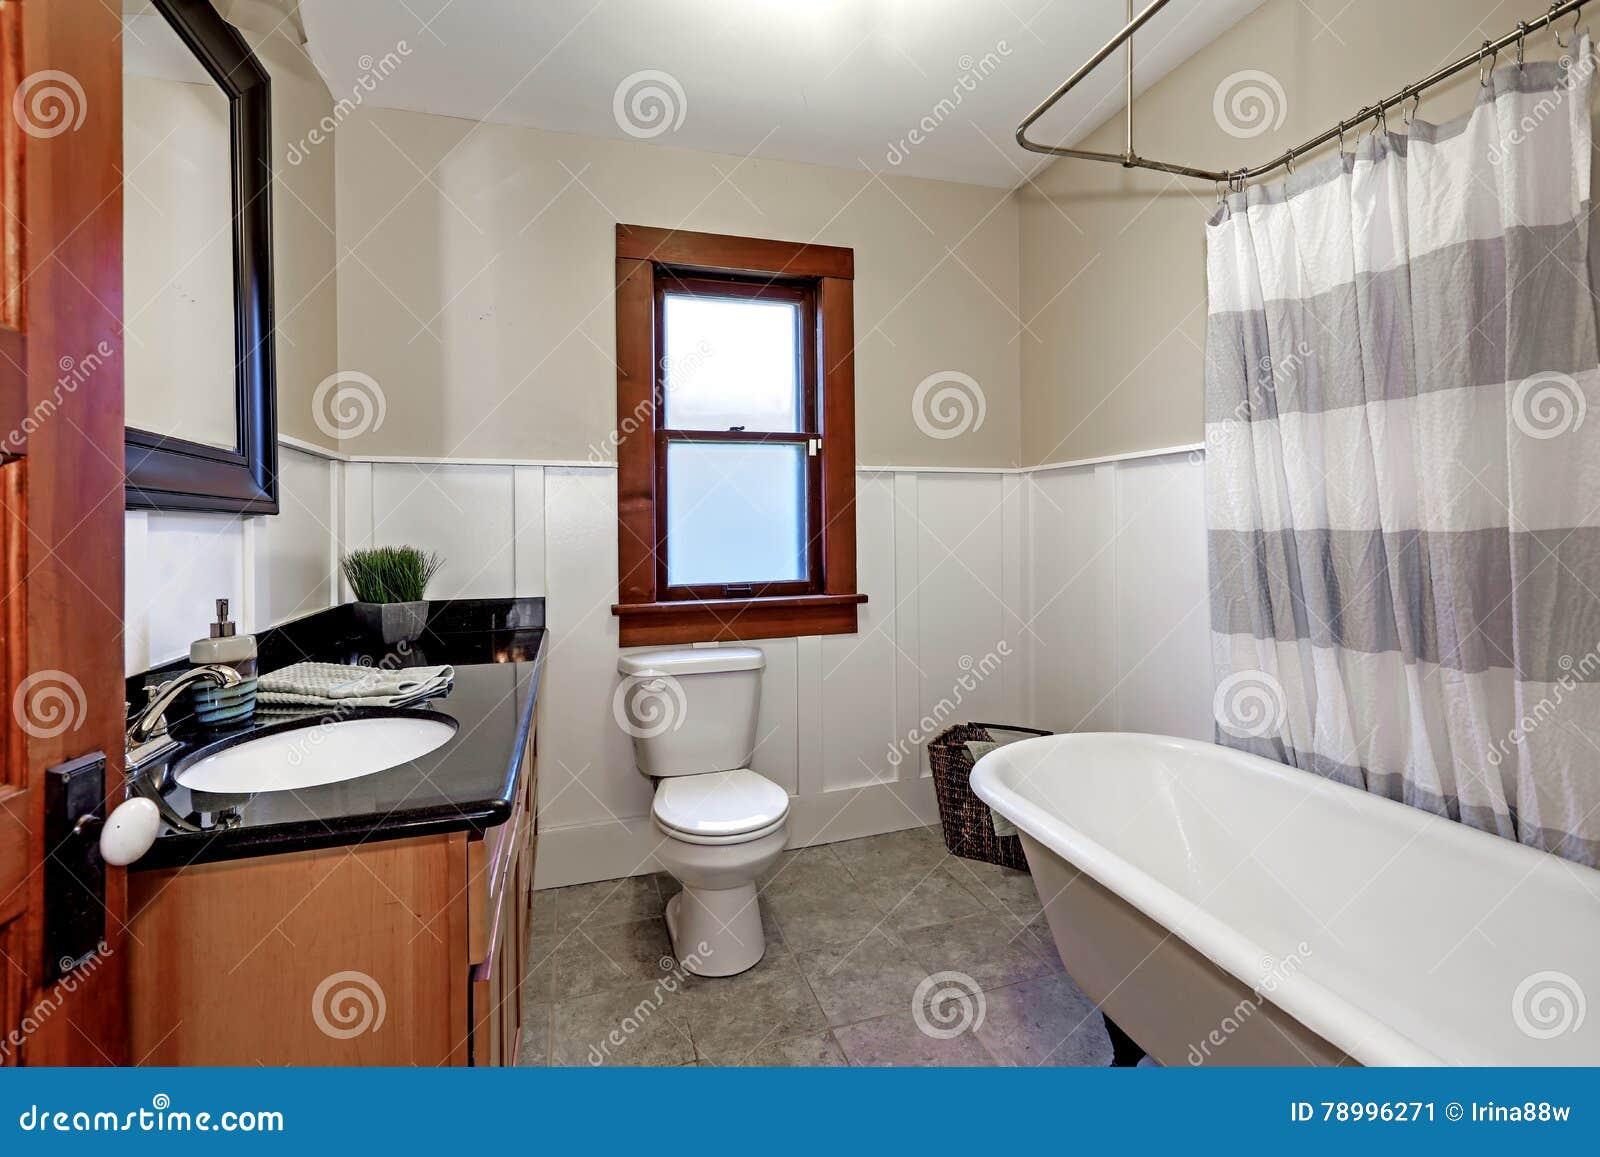 Interieur maison style americain for Interieur maison americaine